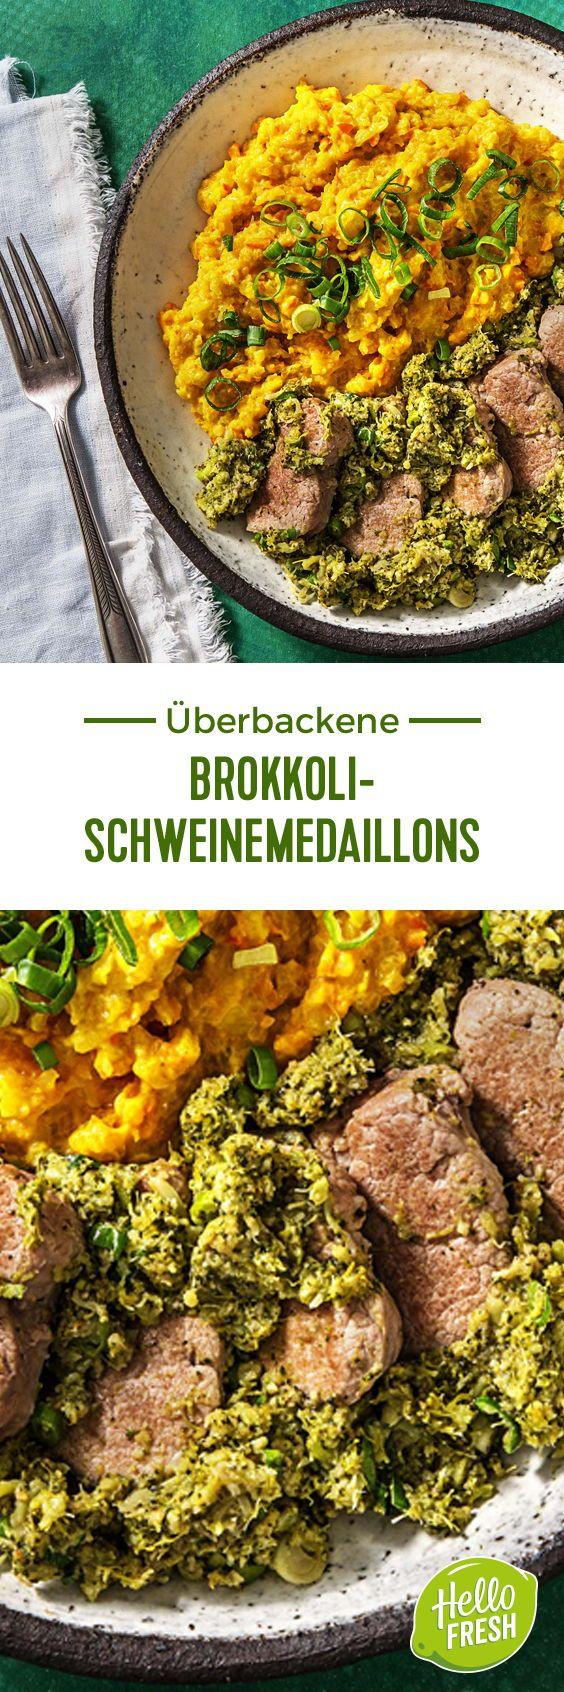 Überbackene Brokkoli-Schweinemedaillons mit Kürbis-Kokos-Püree